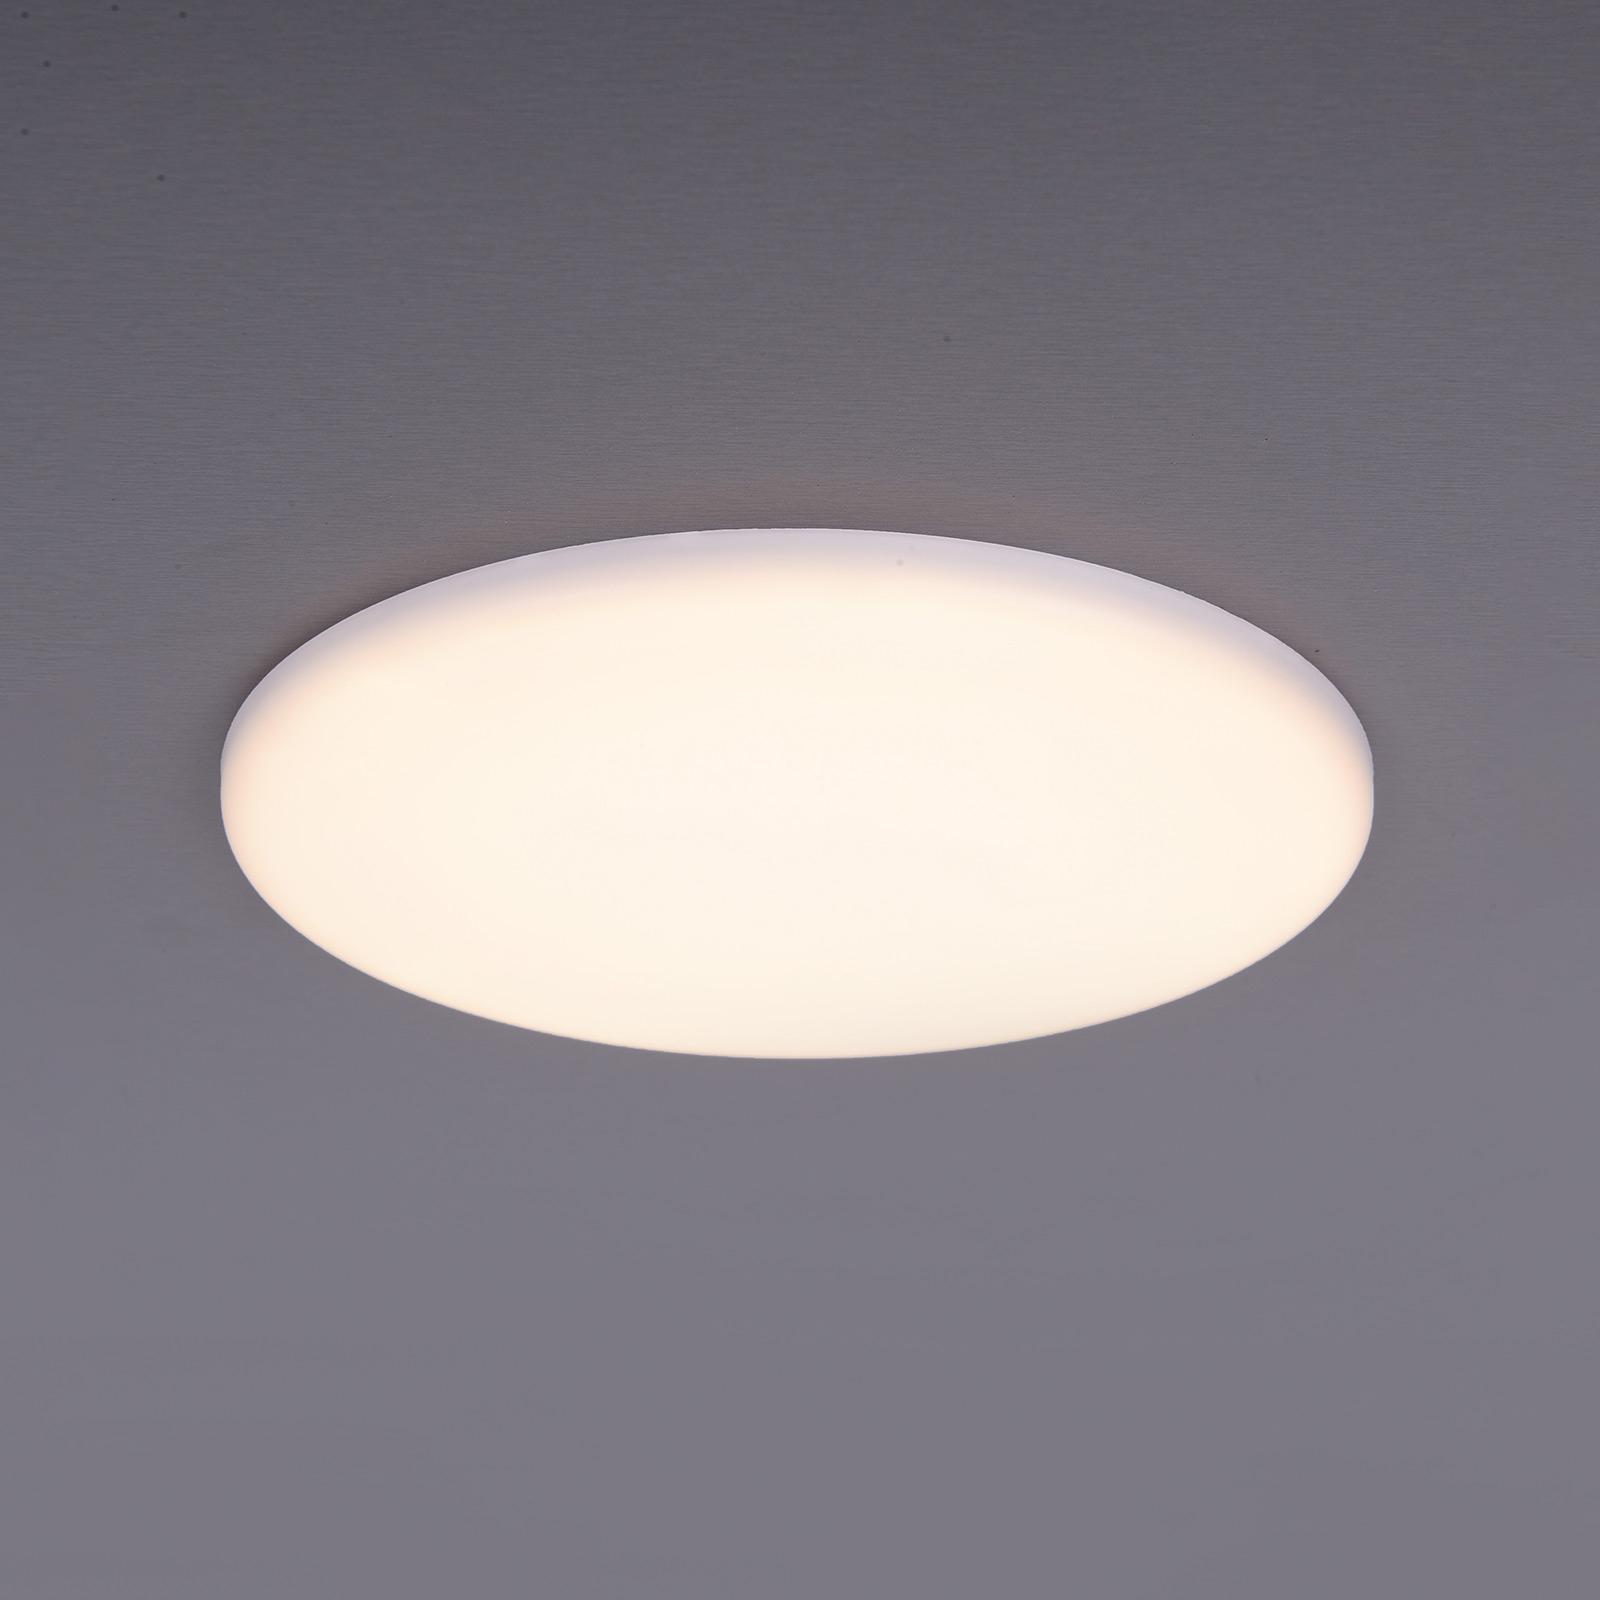 Sula LED-downlight, rund, IP66, 15,5 cm